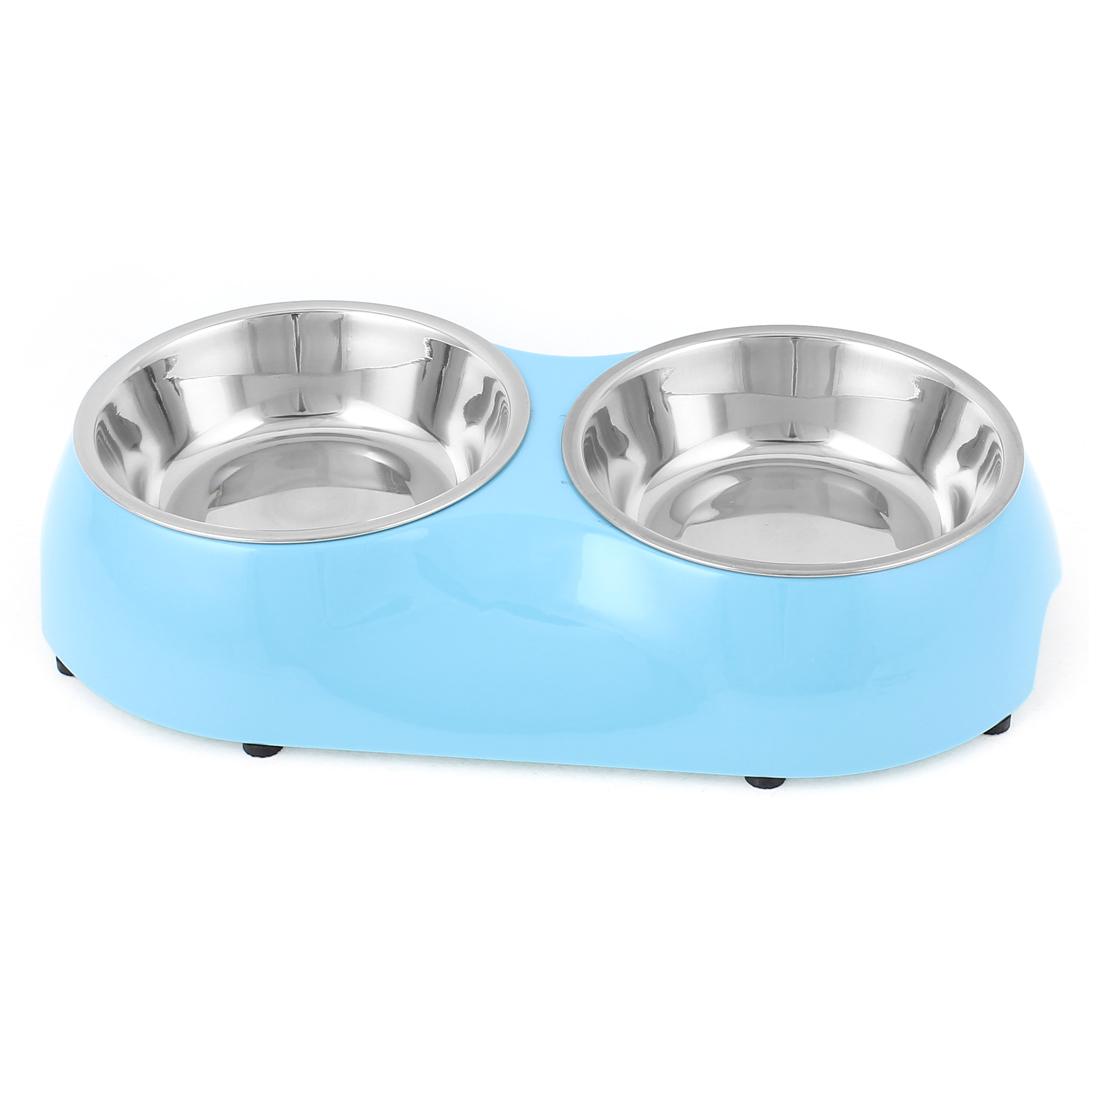 Pet Dog Puppy Plastic Dish Food Water Feeding Feeder Double Bowl Blue